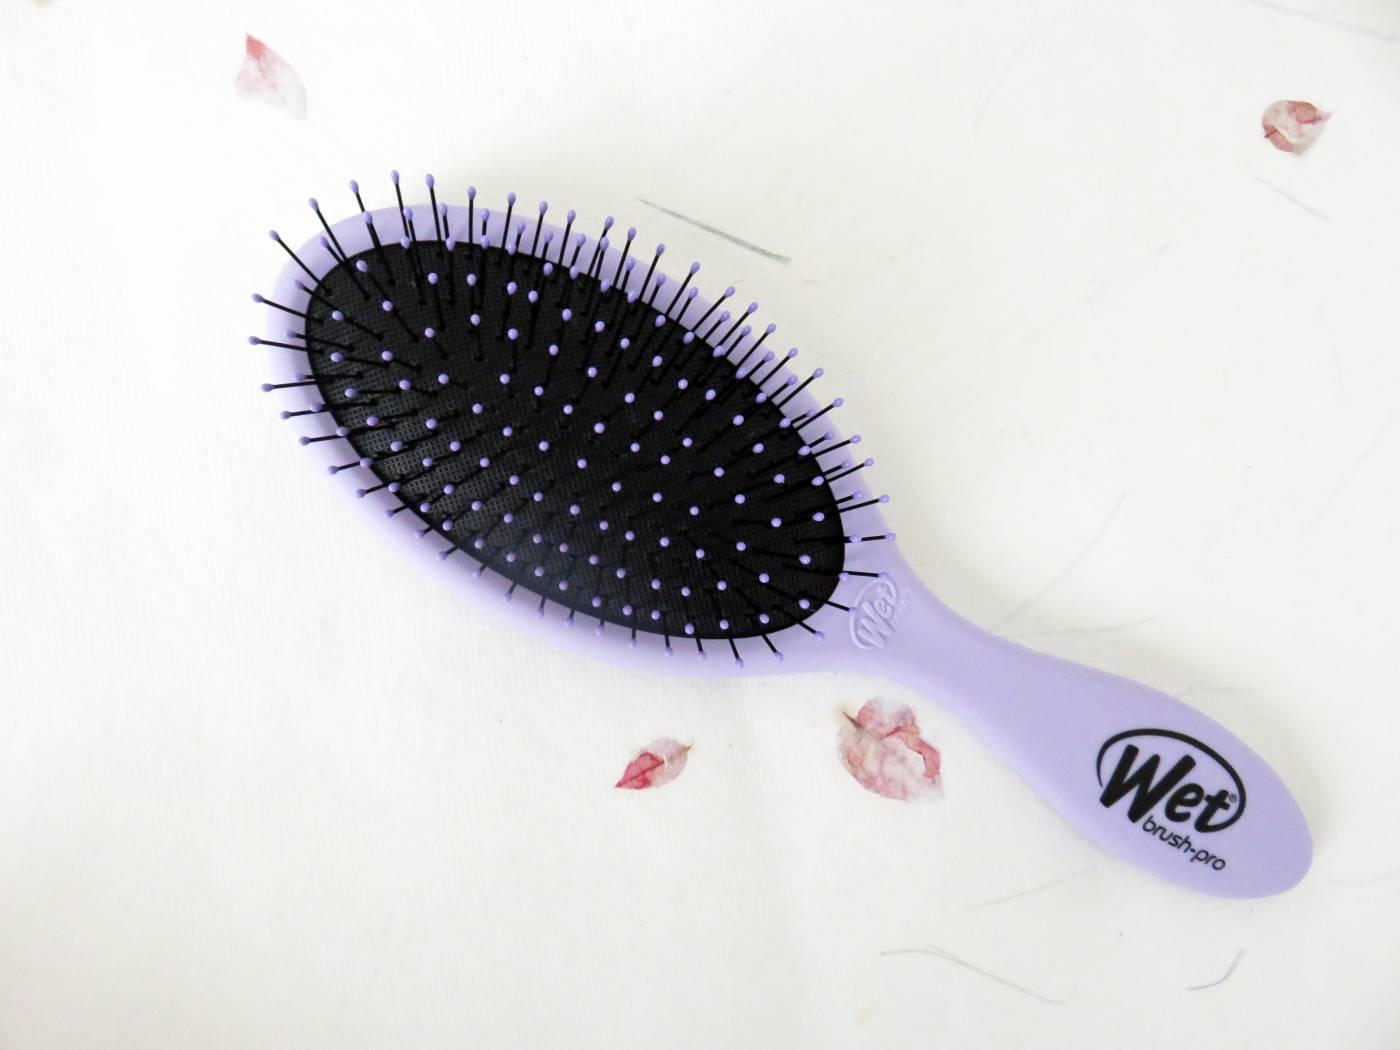 wet hair brush